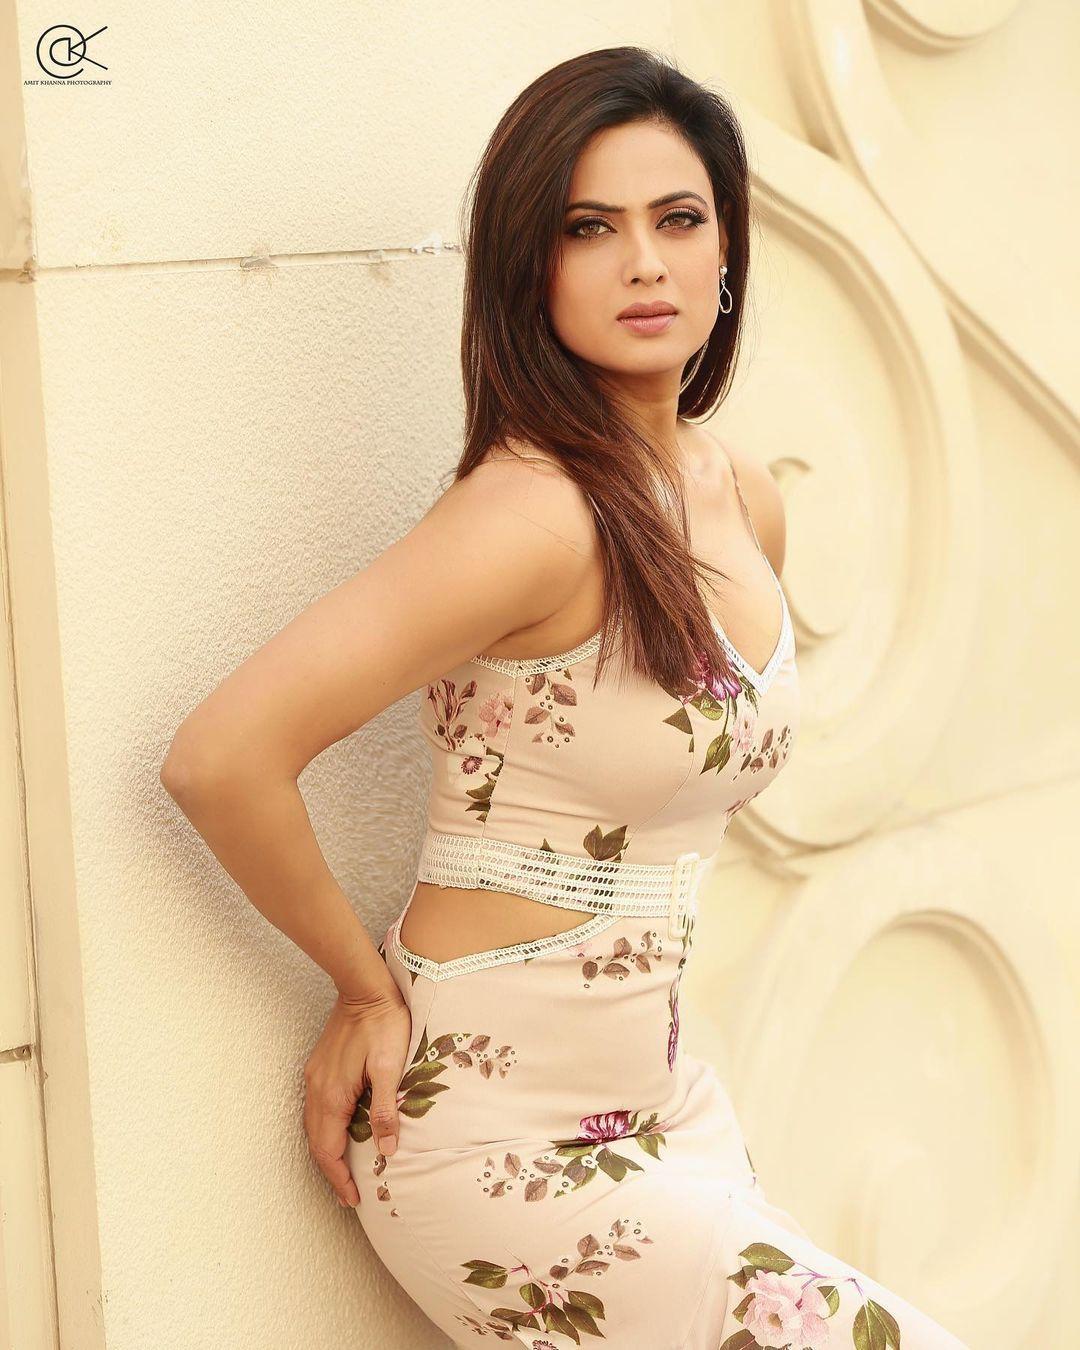 Bollywood actress stylish hot photos Shweta Tiwari looking very attractive and spicy photoshoot 35127